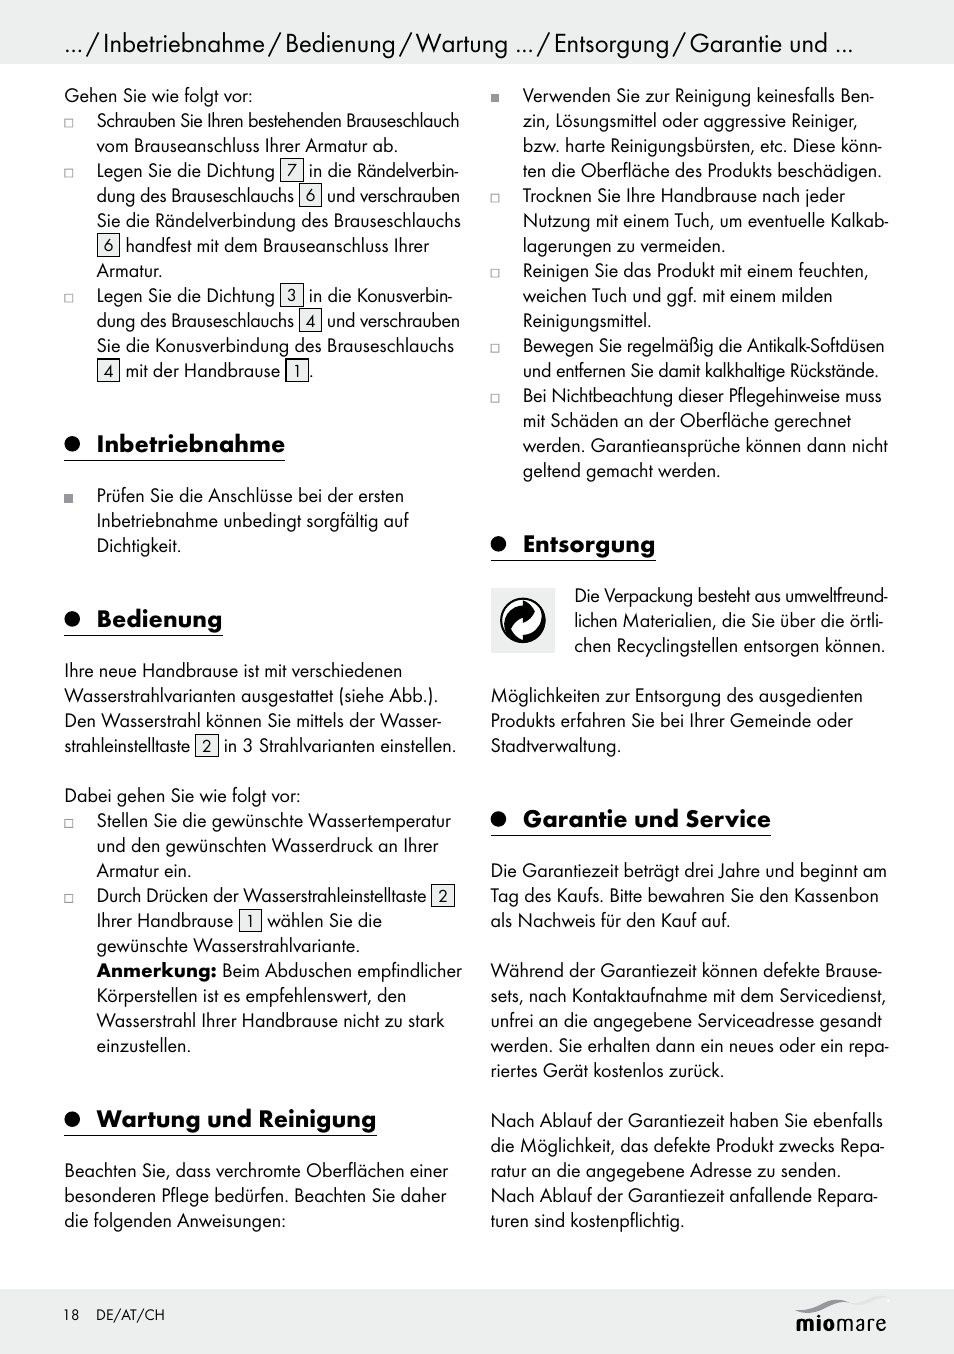 Niedlich Kassenbeleg Rahmen Bilder - Rahmen Ideen - markjohnsonshow.info